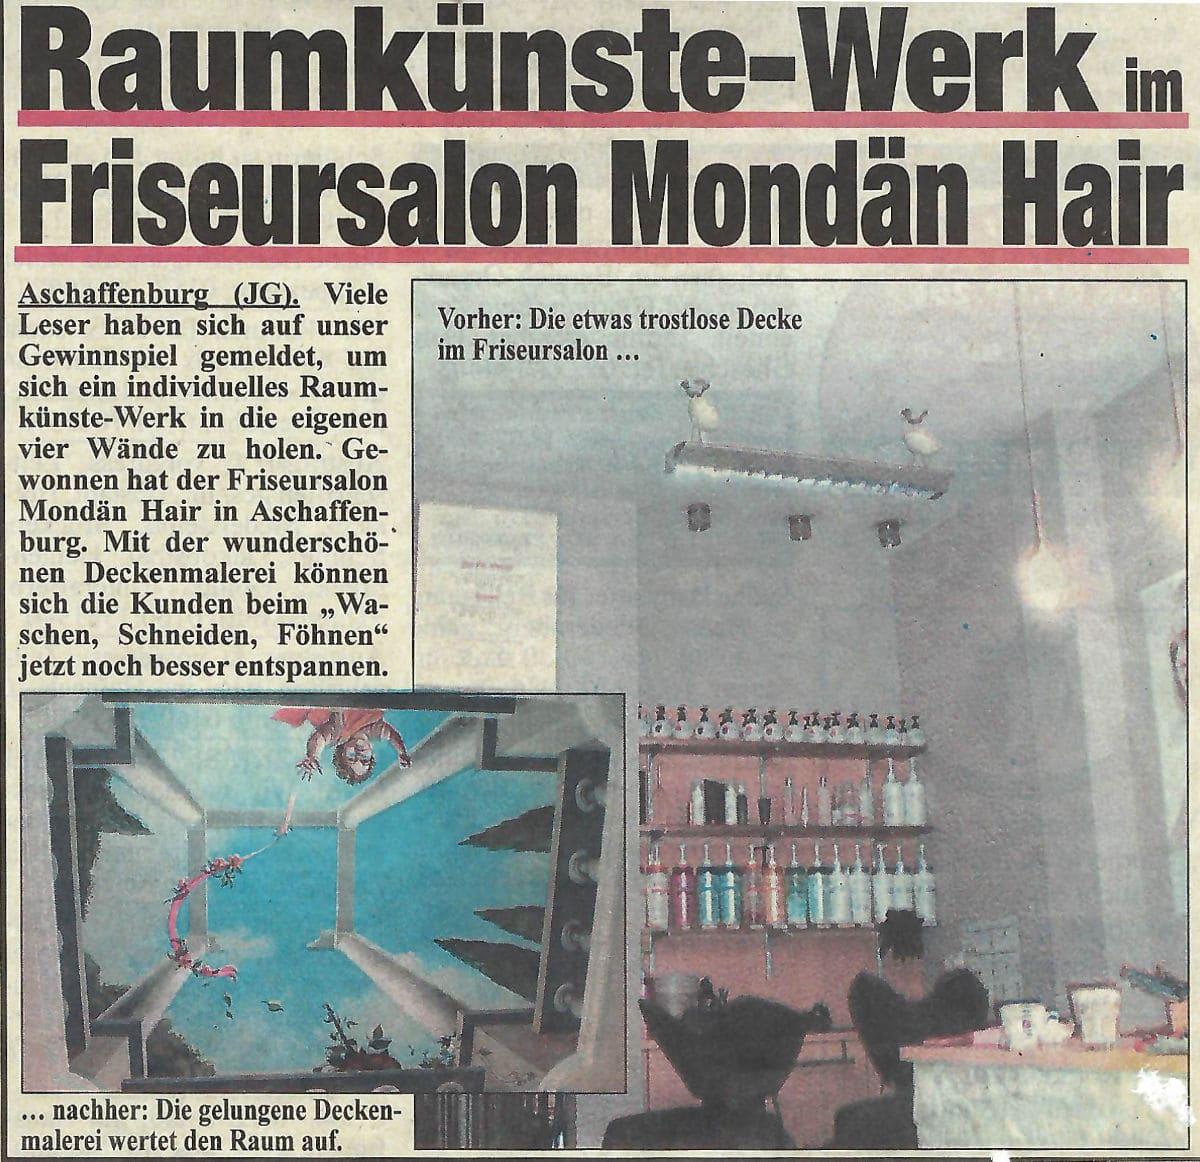 Raumkünste Werk im Friseursalon Mondän Hair (Andrea Kraus / undatiert)